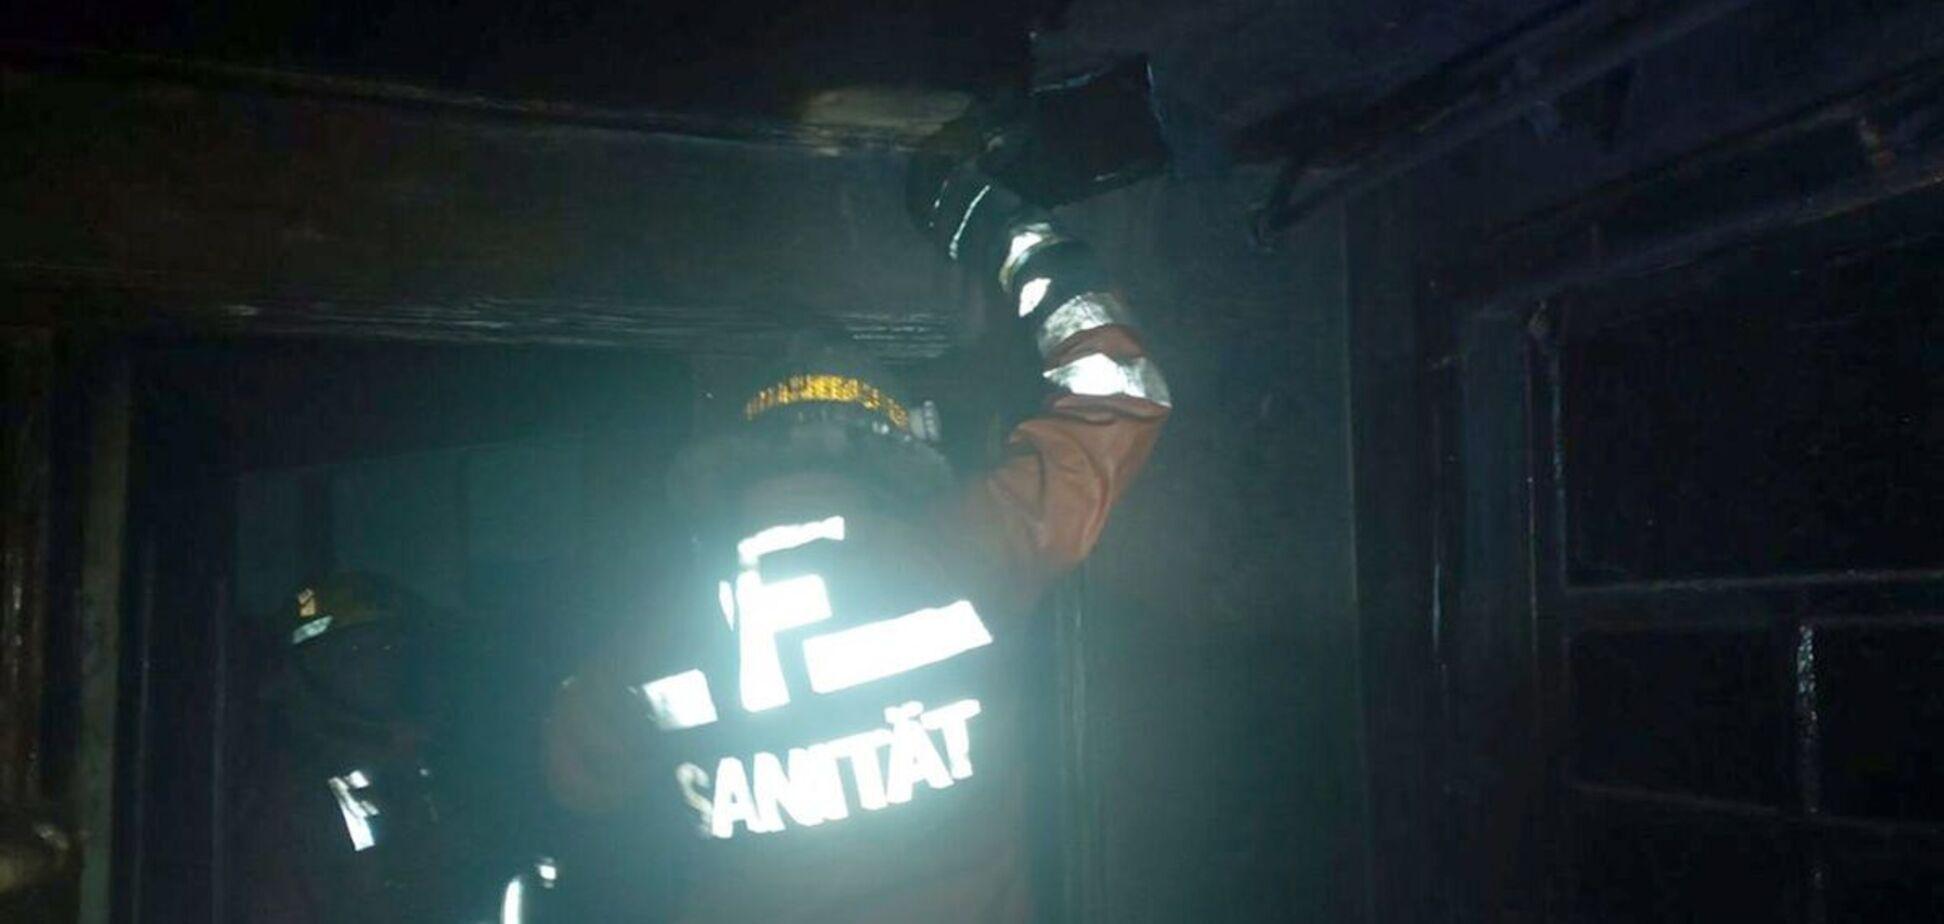 Под Днепром во время пожара погиб 92-летний мужчина. Фото с места ЧП